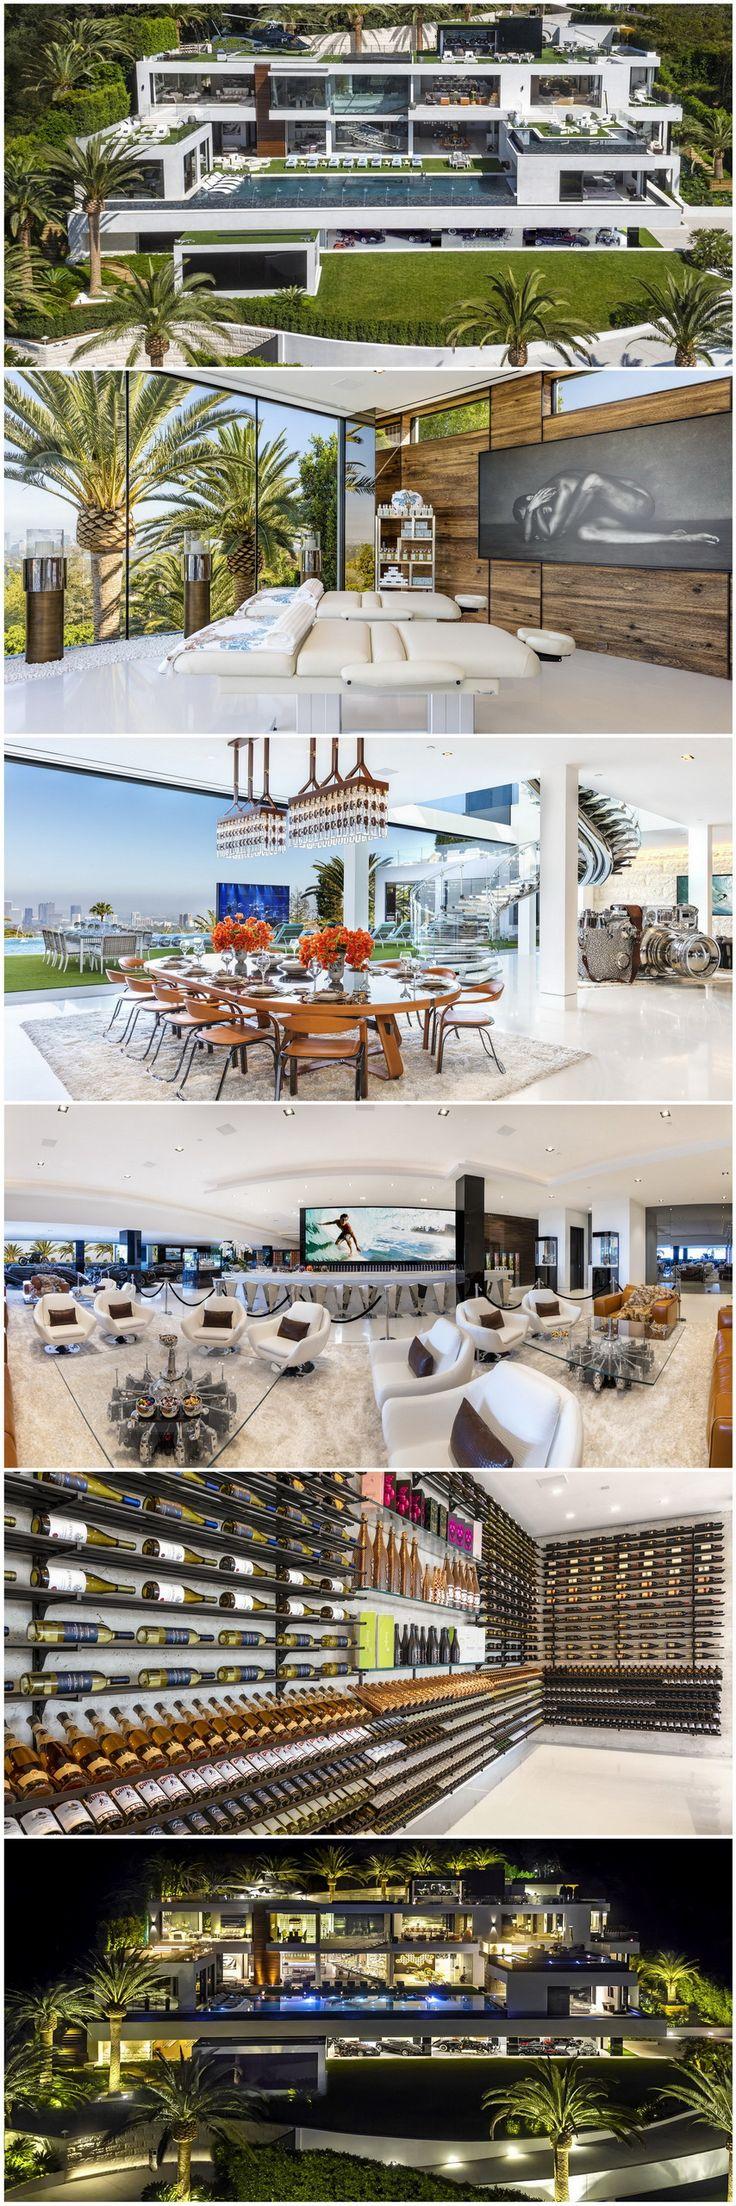 Luxus moderne esszimmer sets  best architecture images on pinterest  modern homes modern